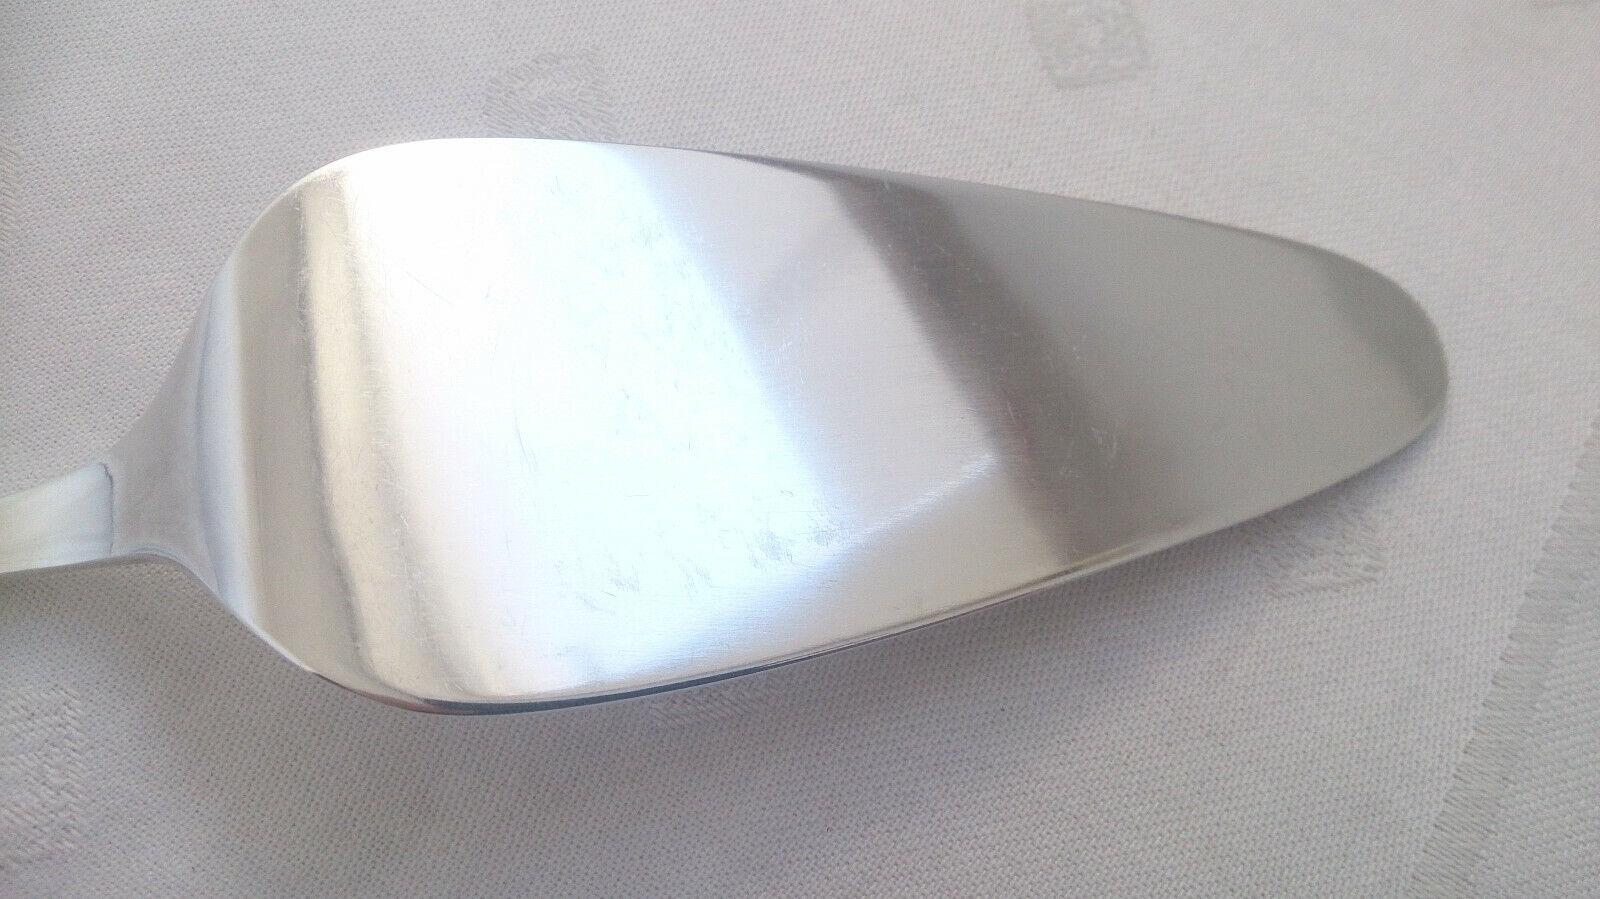 WMF Brasilia versilbert auf cromargan cromargan cromargan 1 Tortenheber 21,4 cm 90er Silber TOP | Adoptieren  357237